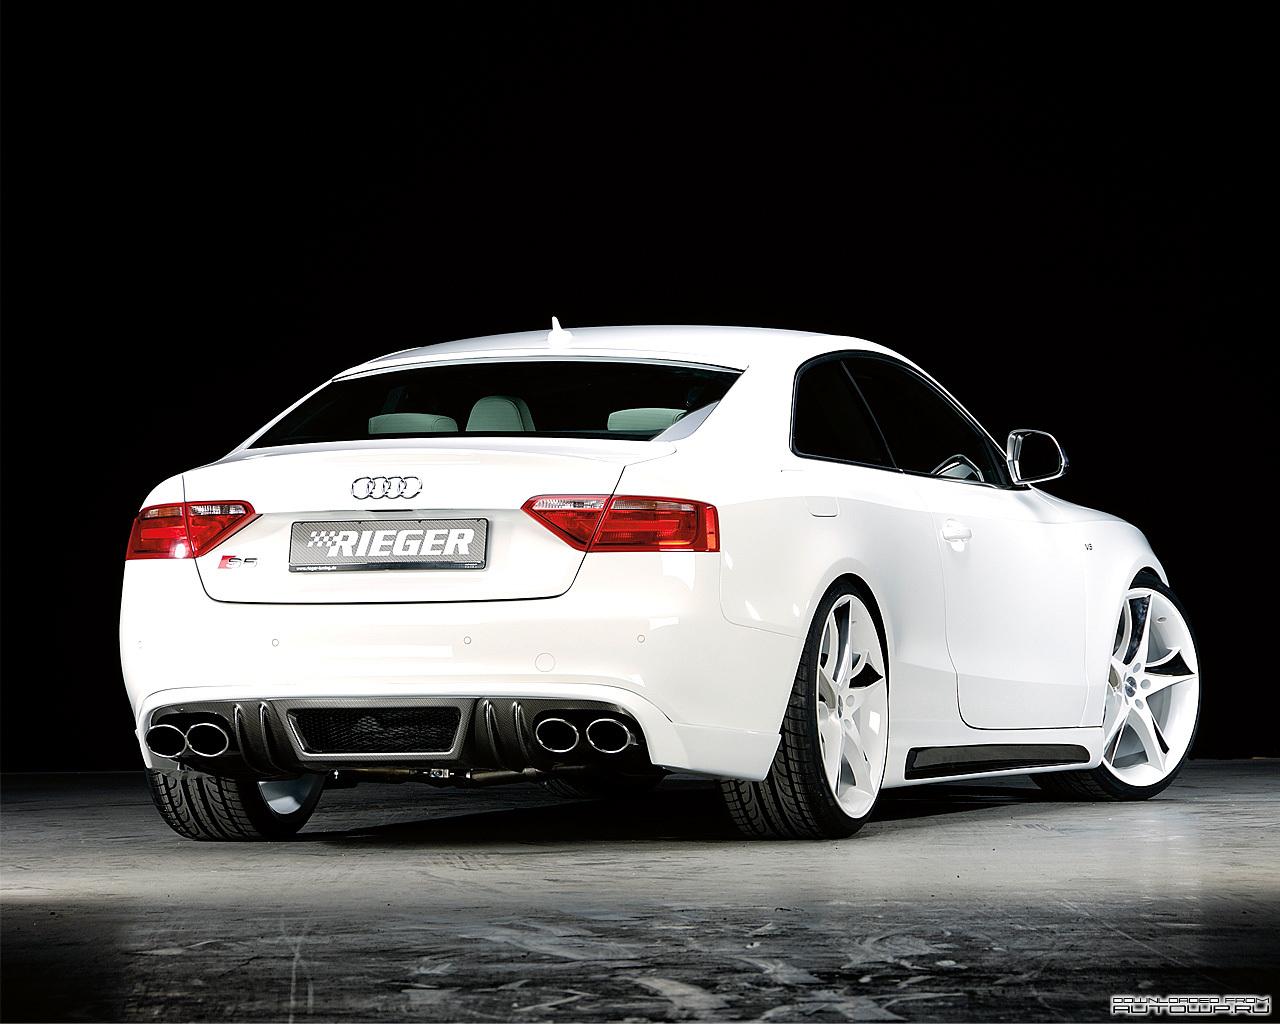 Audi Car Wallpapers Hd Nice Wallpapers